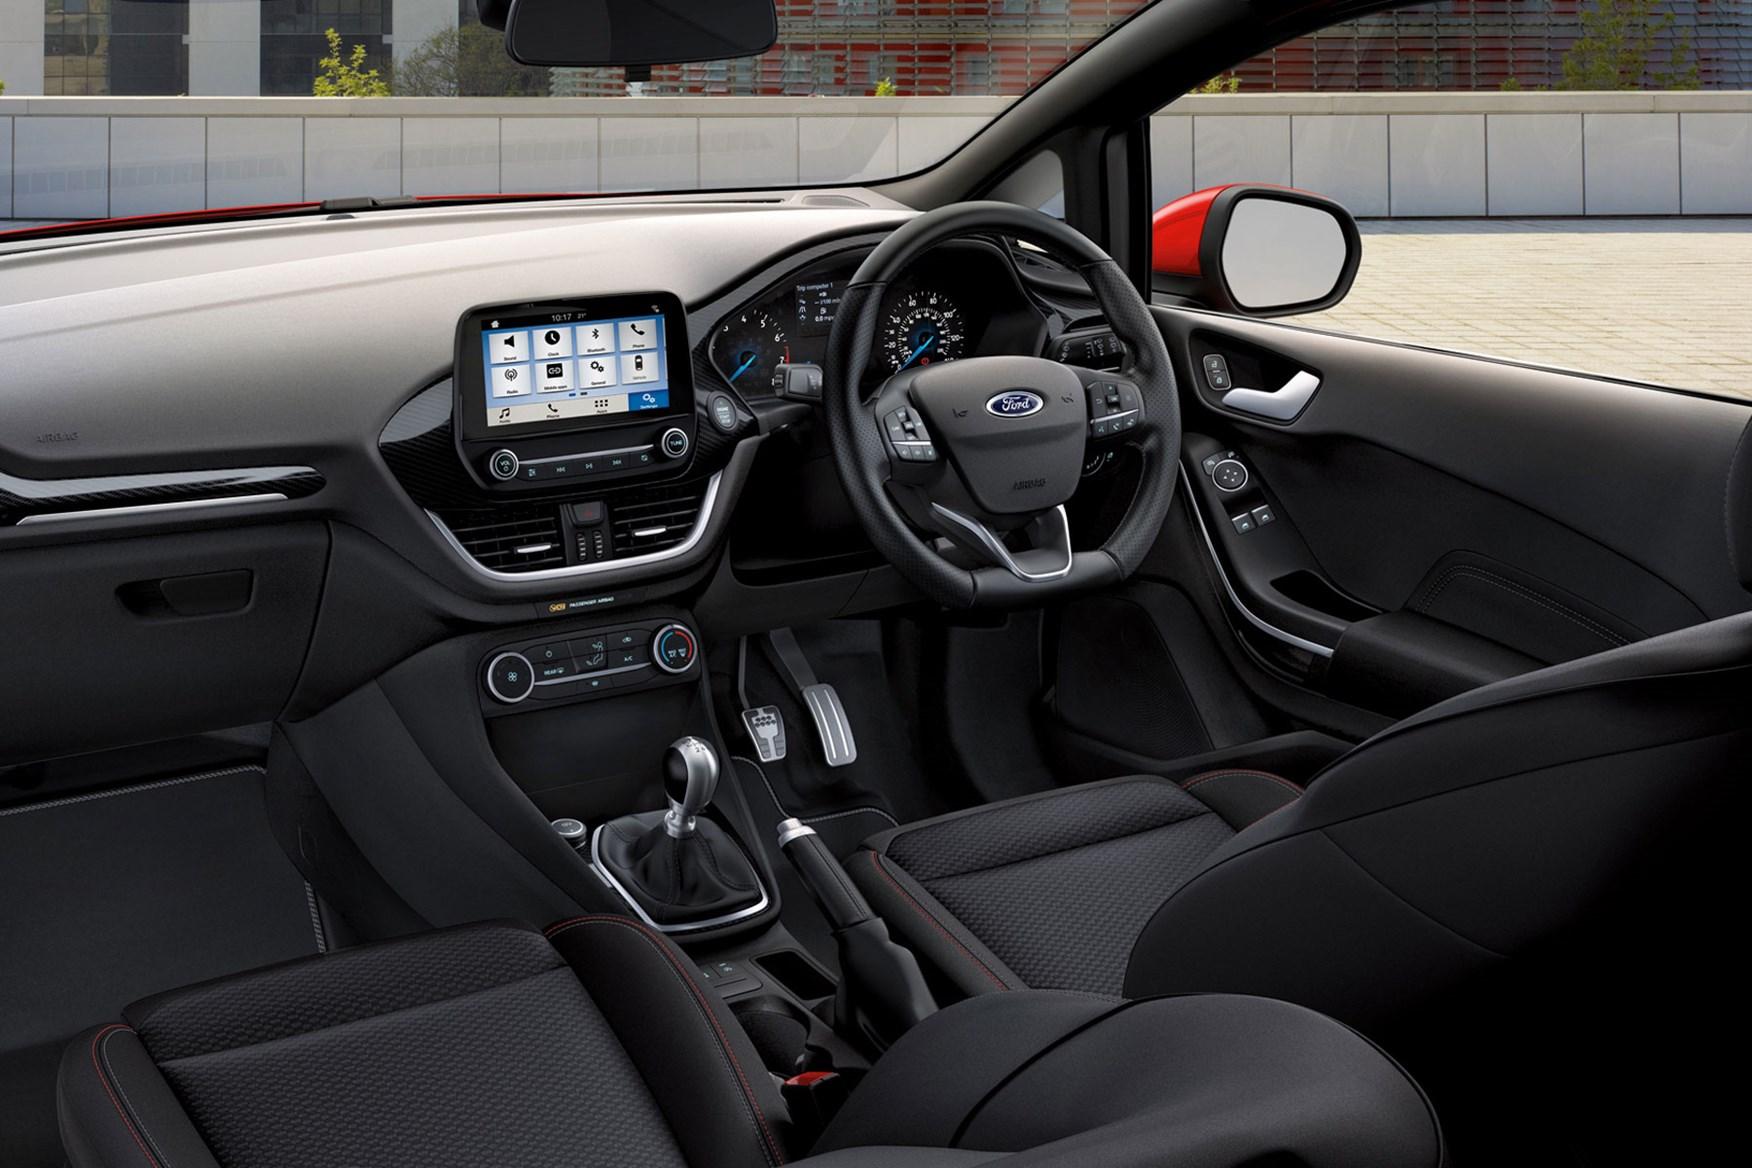 Ford Fiesta Sport Van review - interior